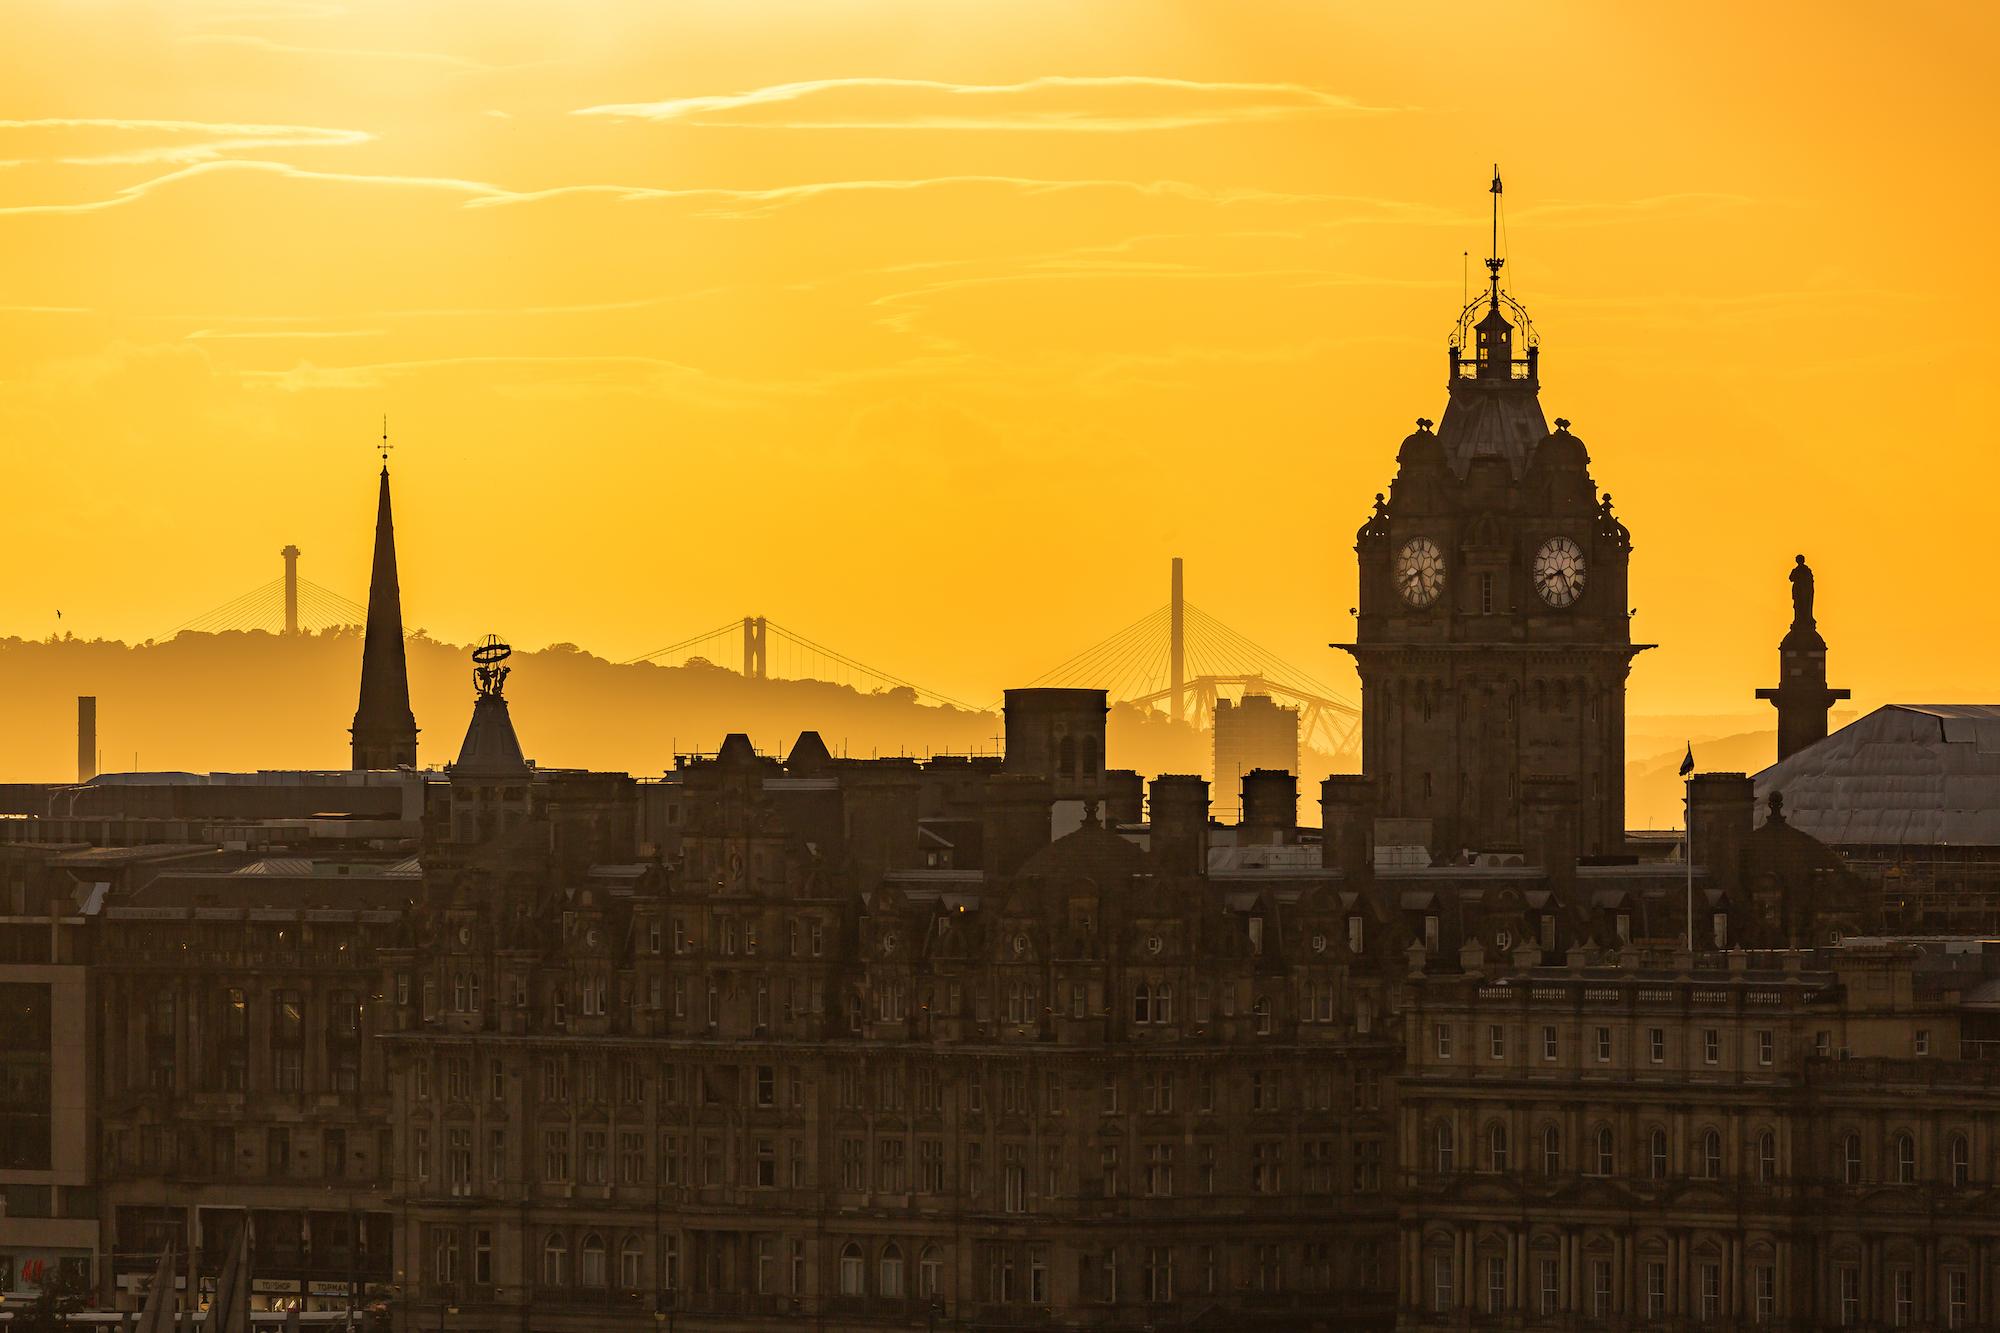 (204) (PO) Balmoral Hotel and Forth Bridges, Edinburgh, Scotland.jpg